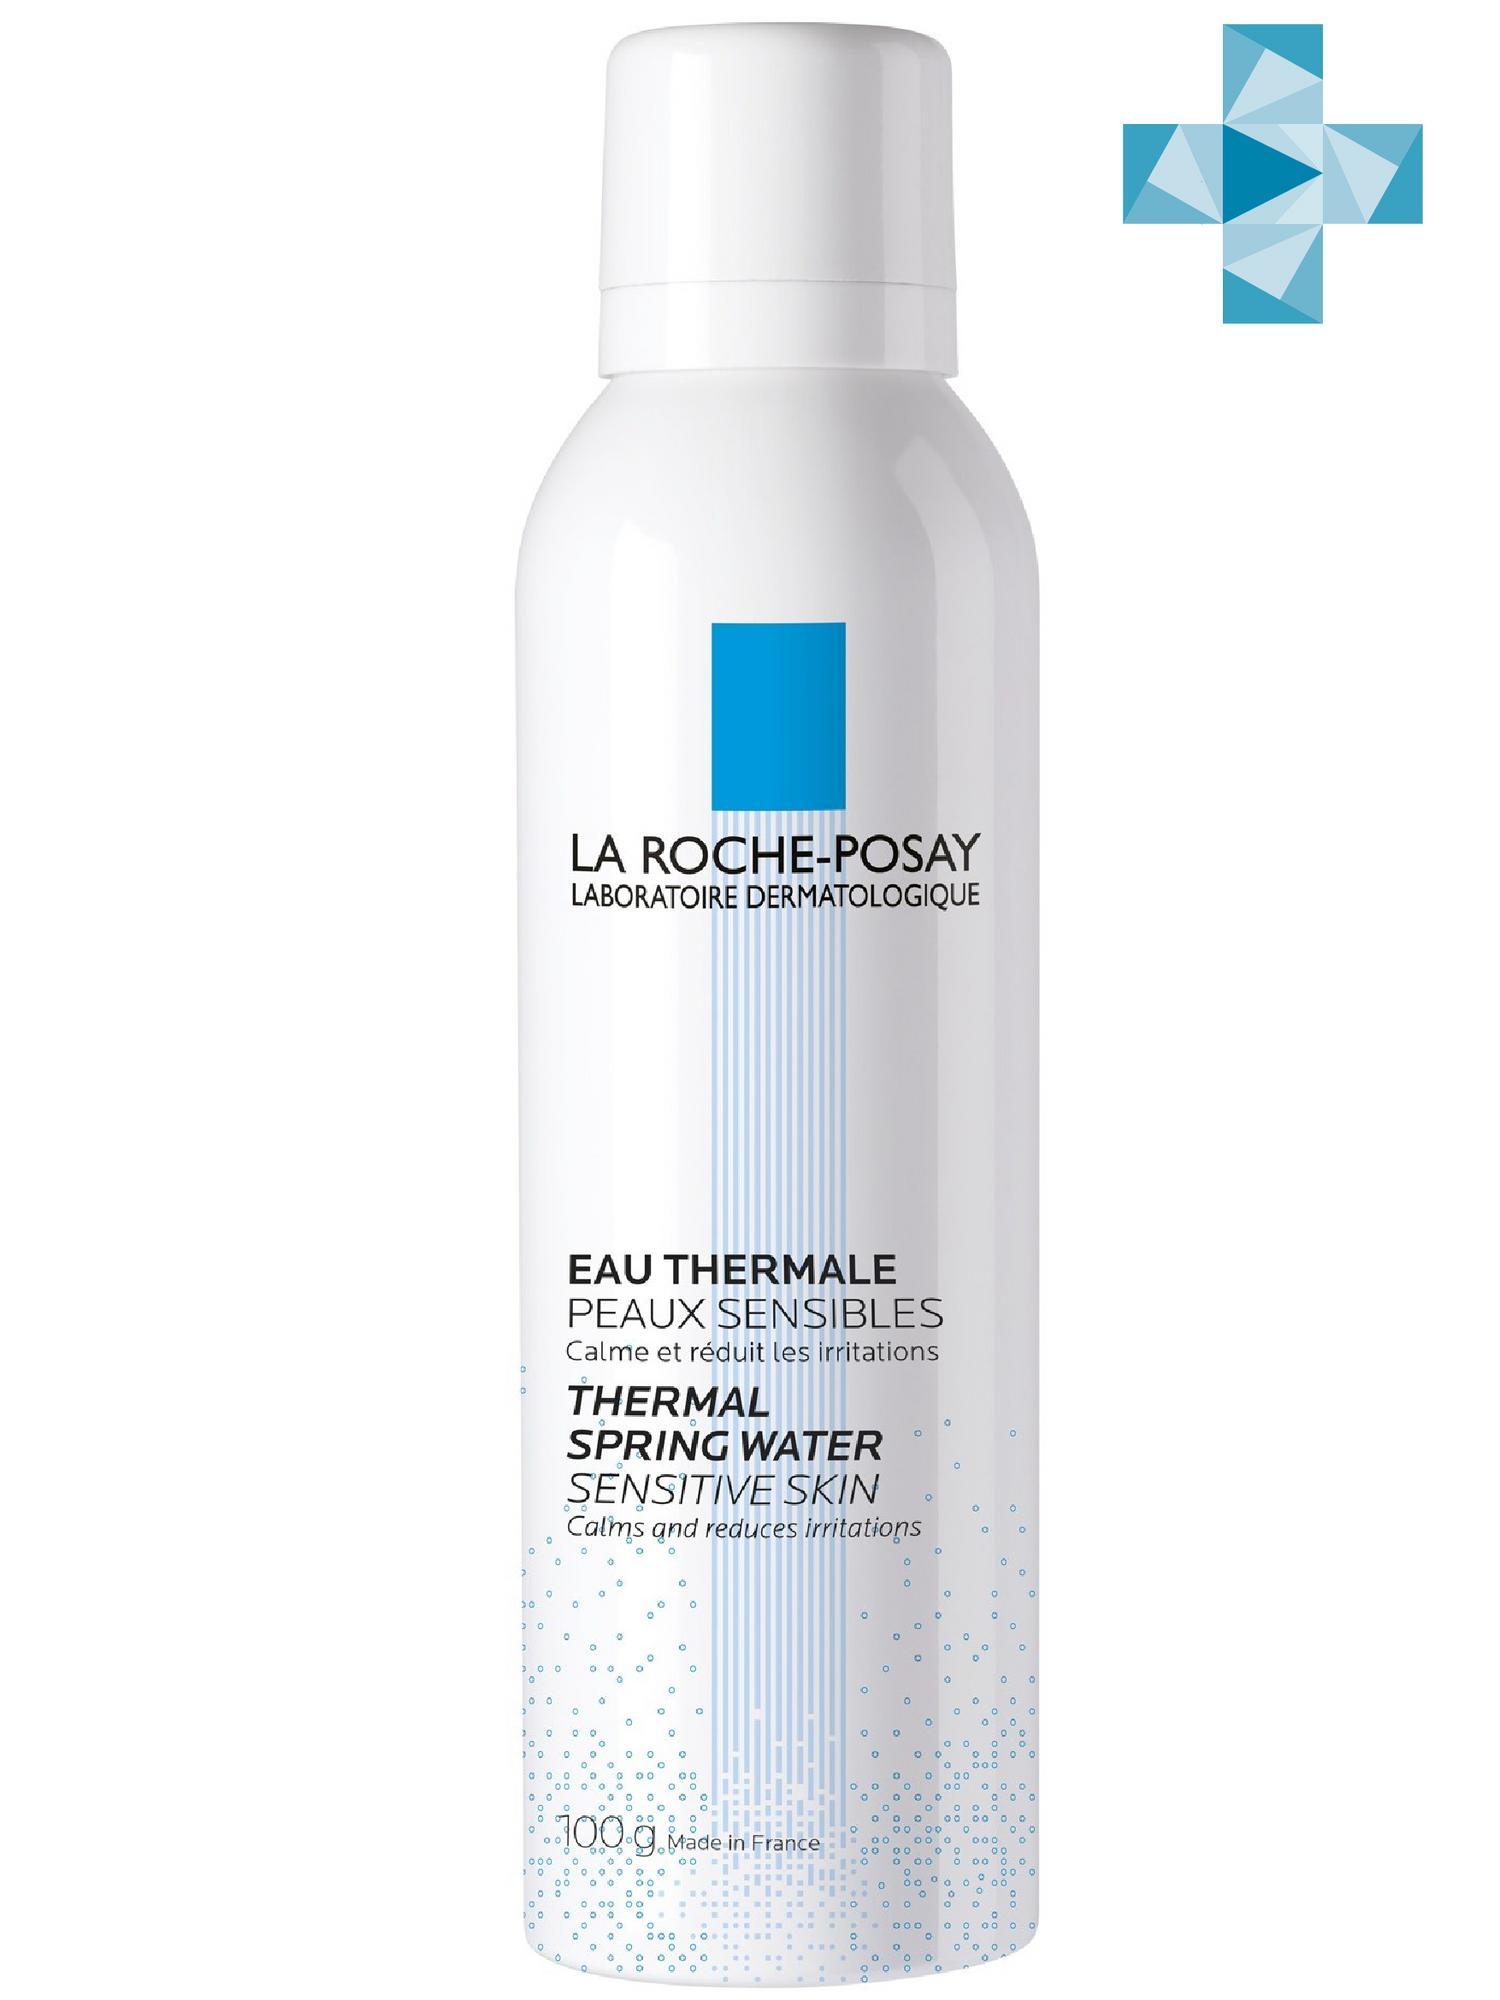 La Roche-Posay Термальная вода La Roche-Posay, 100 мл (La Roche-Posay, Thermal Water)